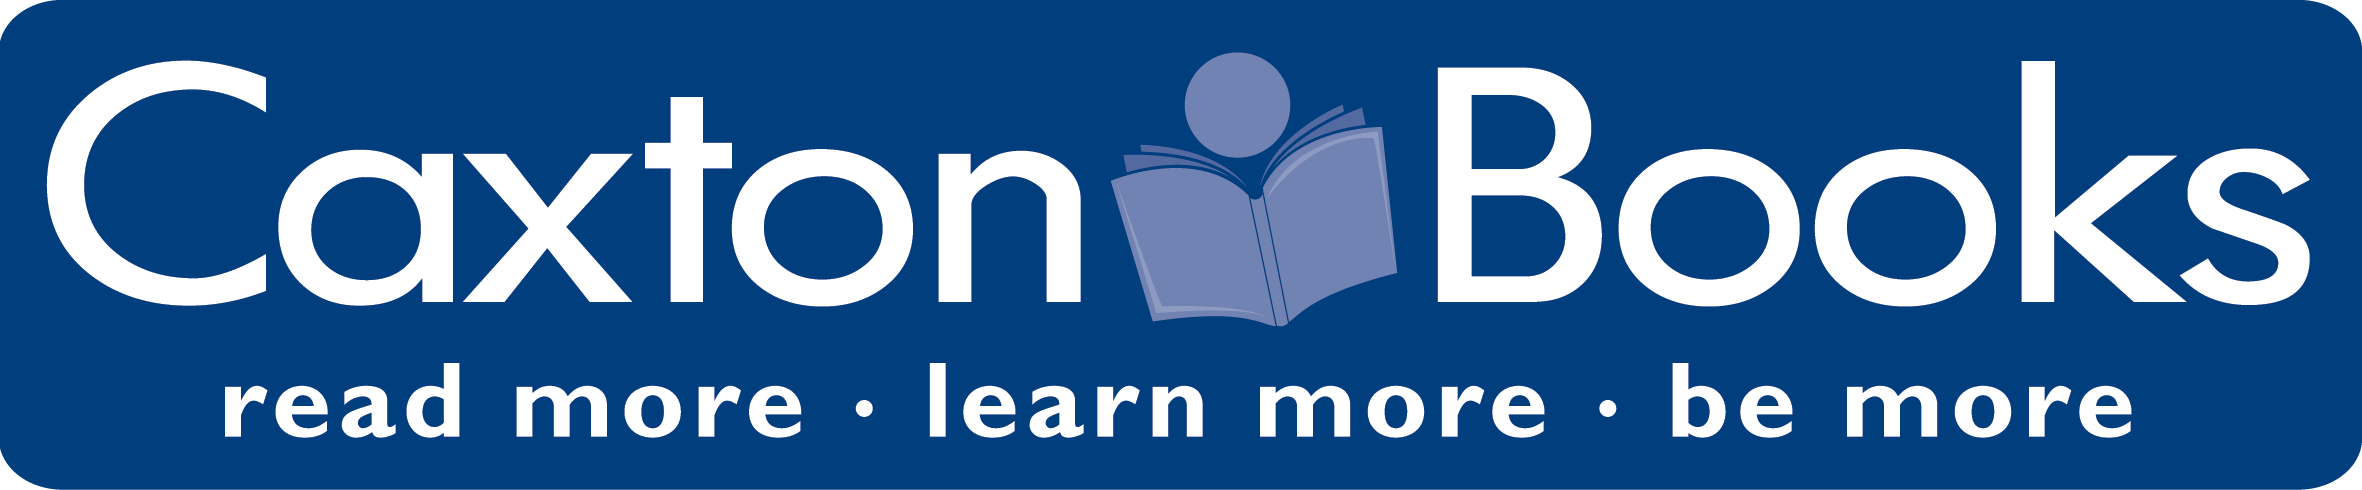 Caxton Books logo